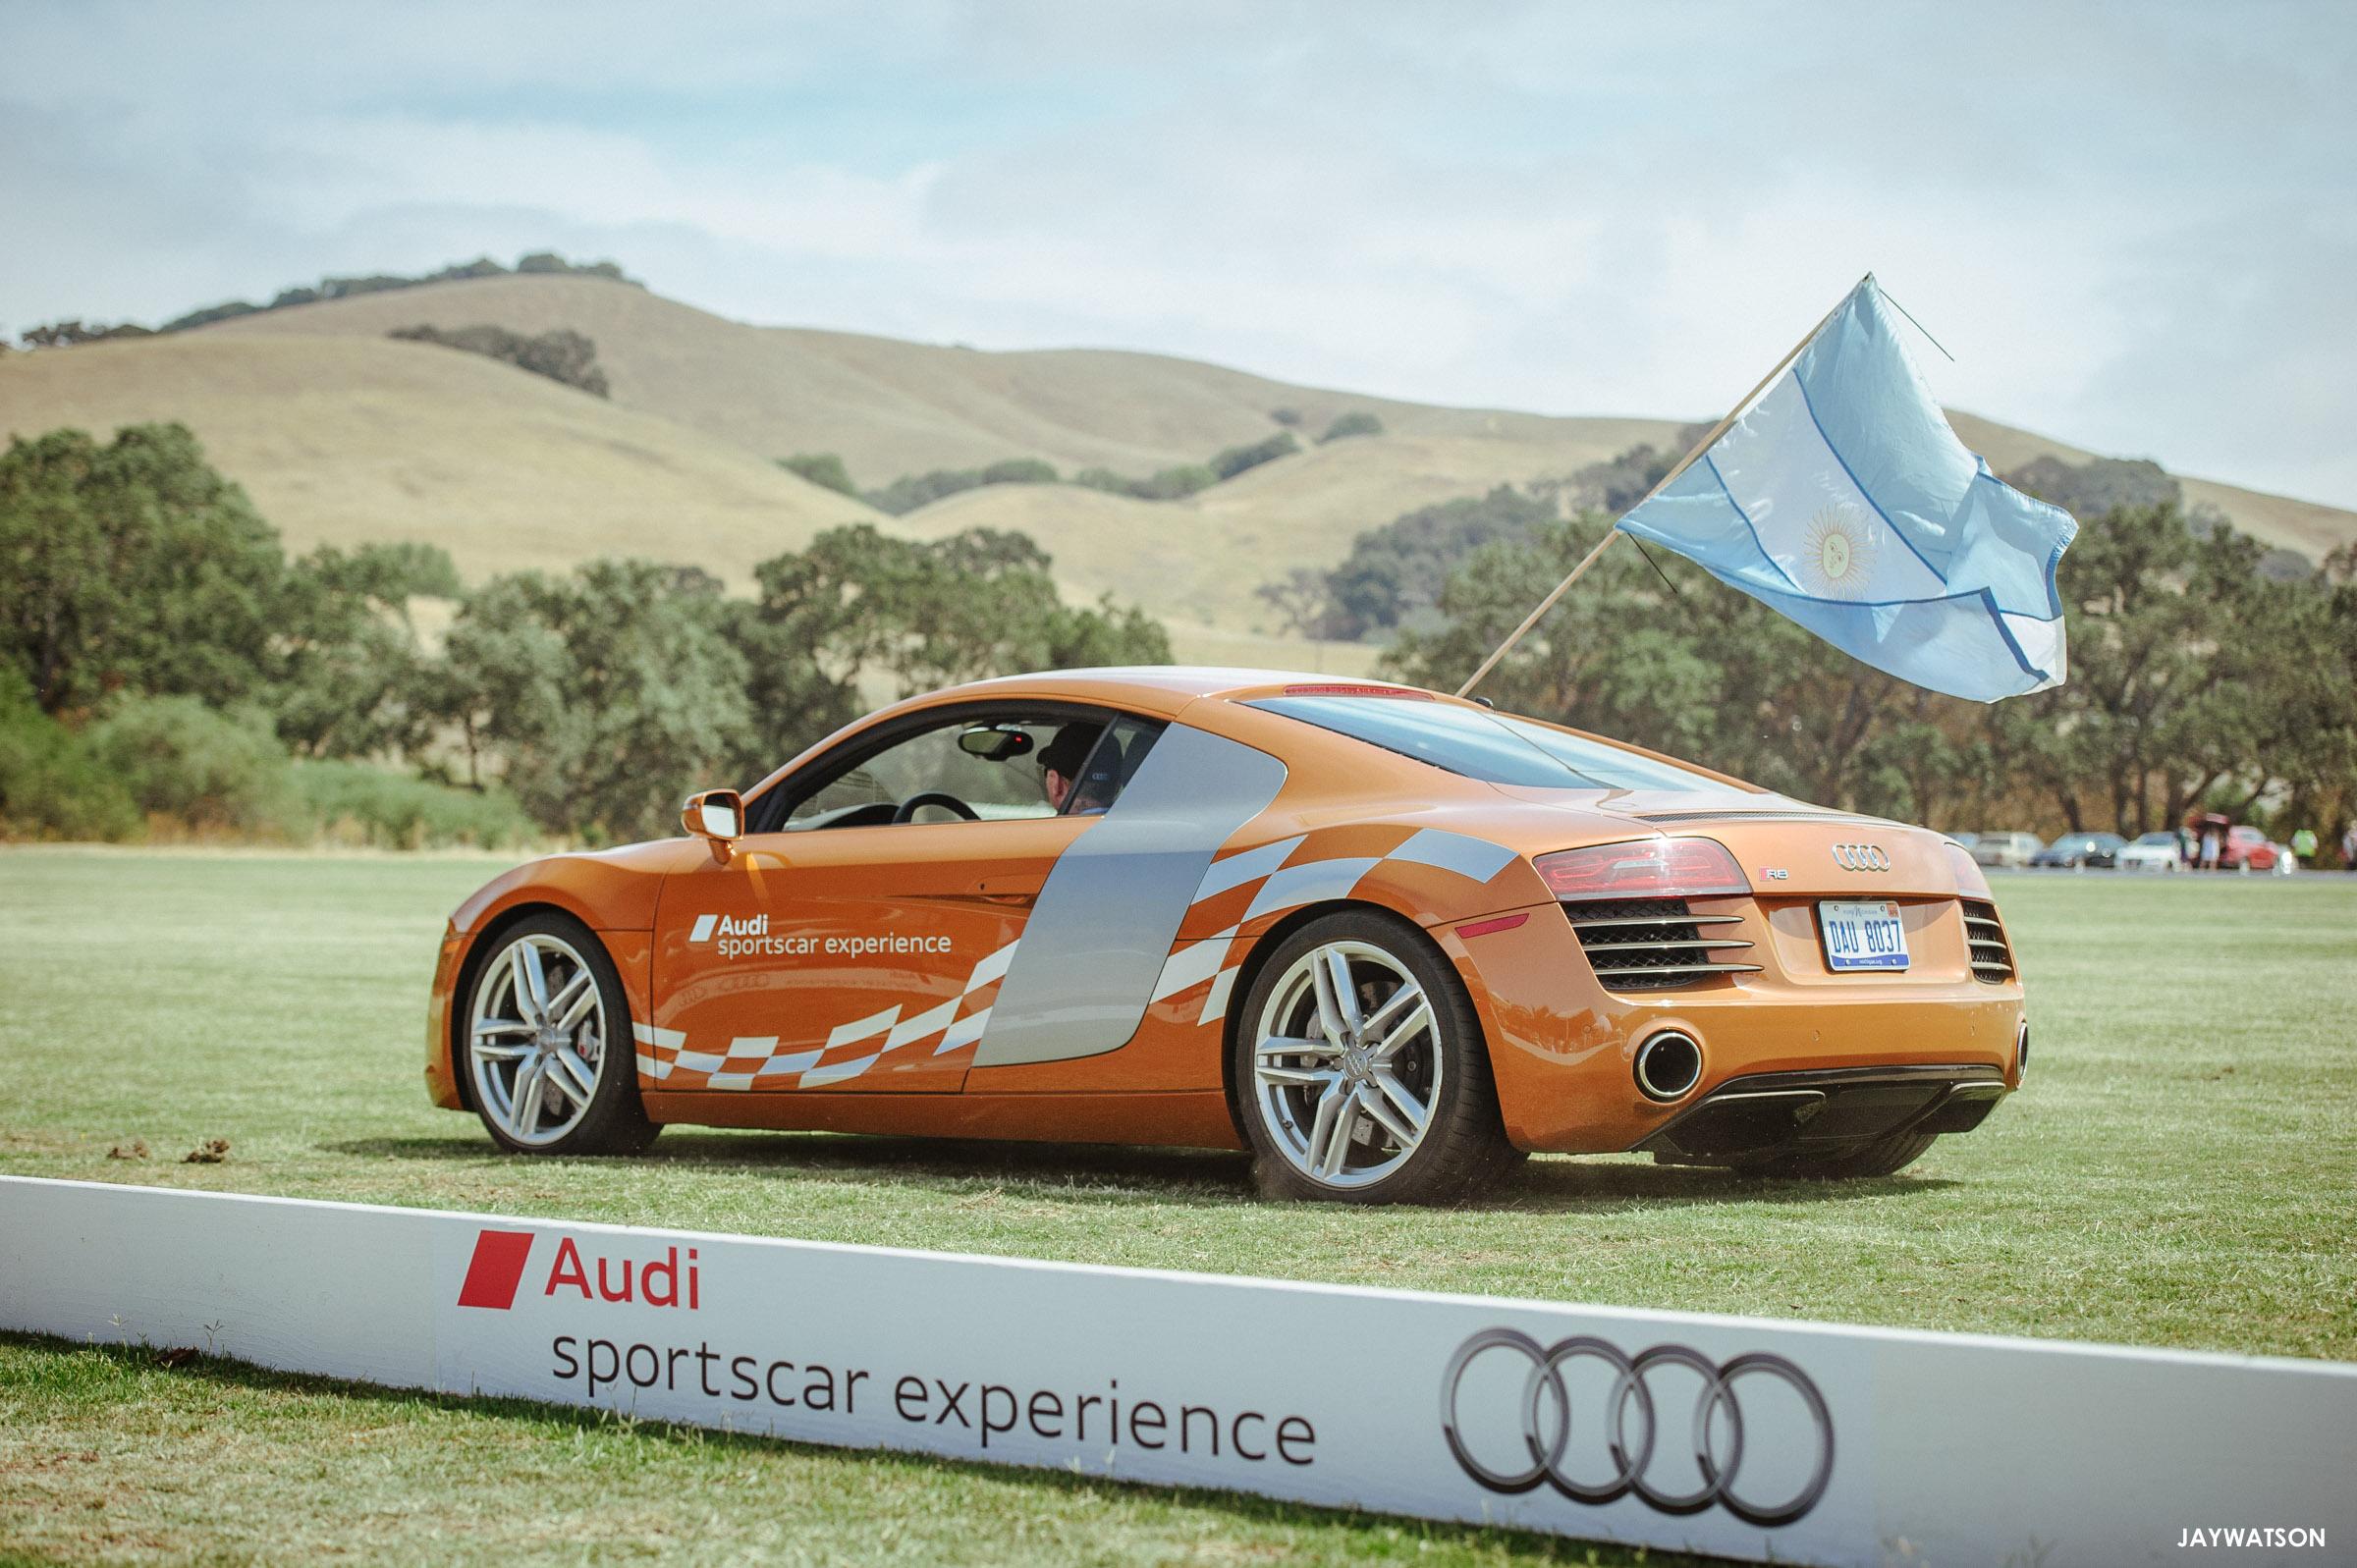 San Francisco Polo Classic. Petaluma, CA | Audi sporstcar experience